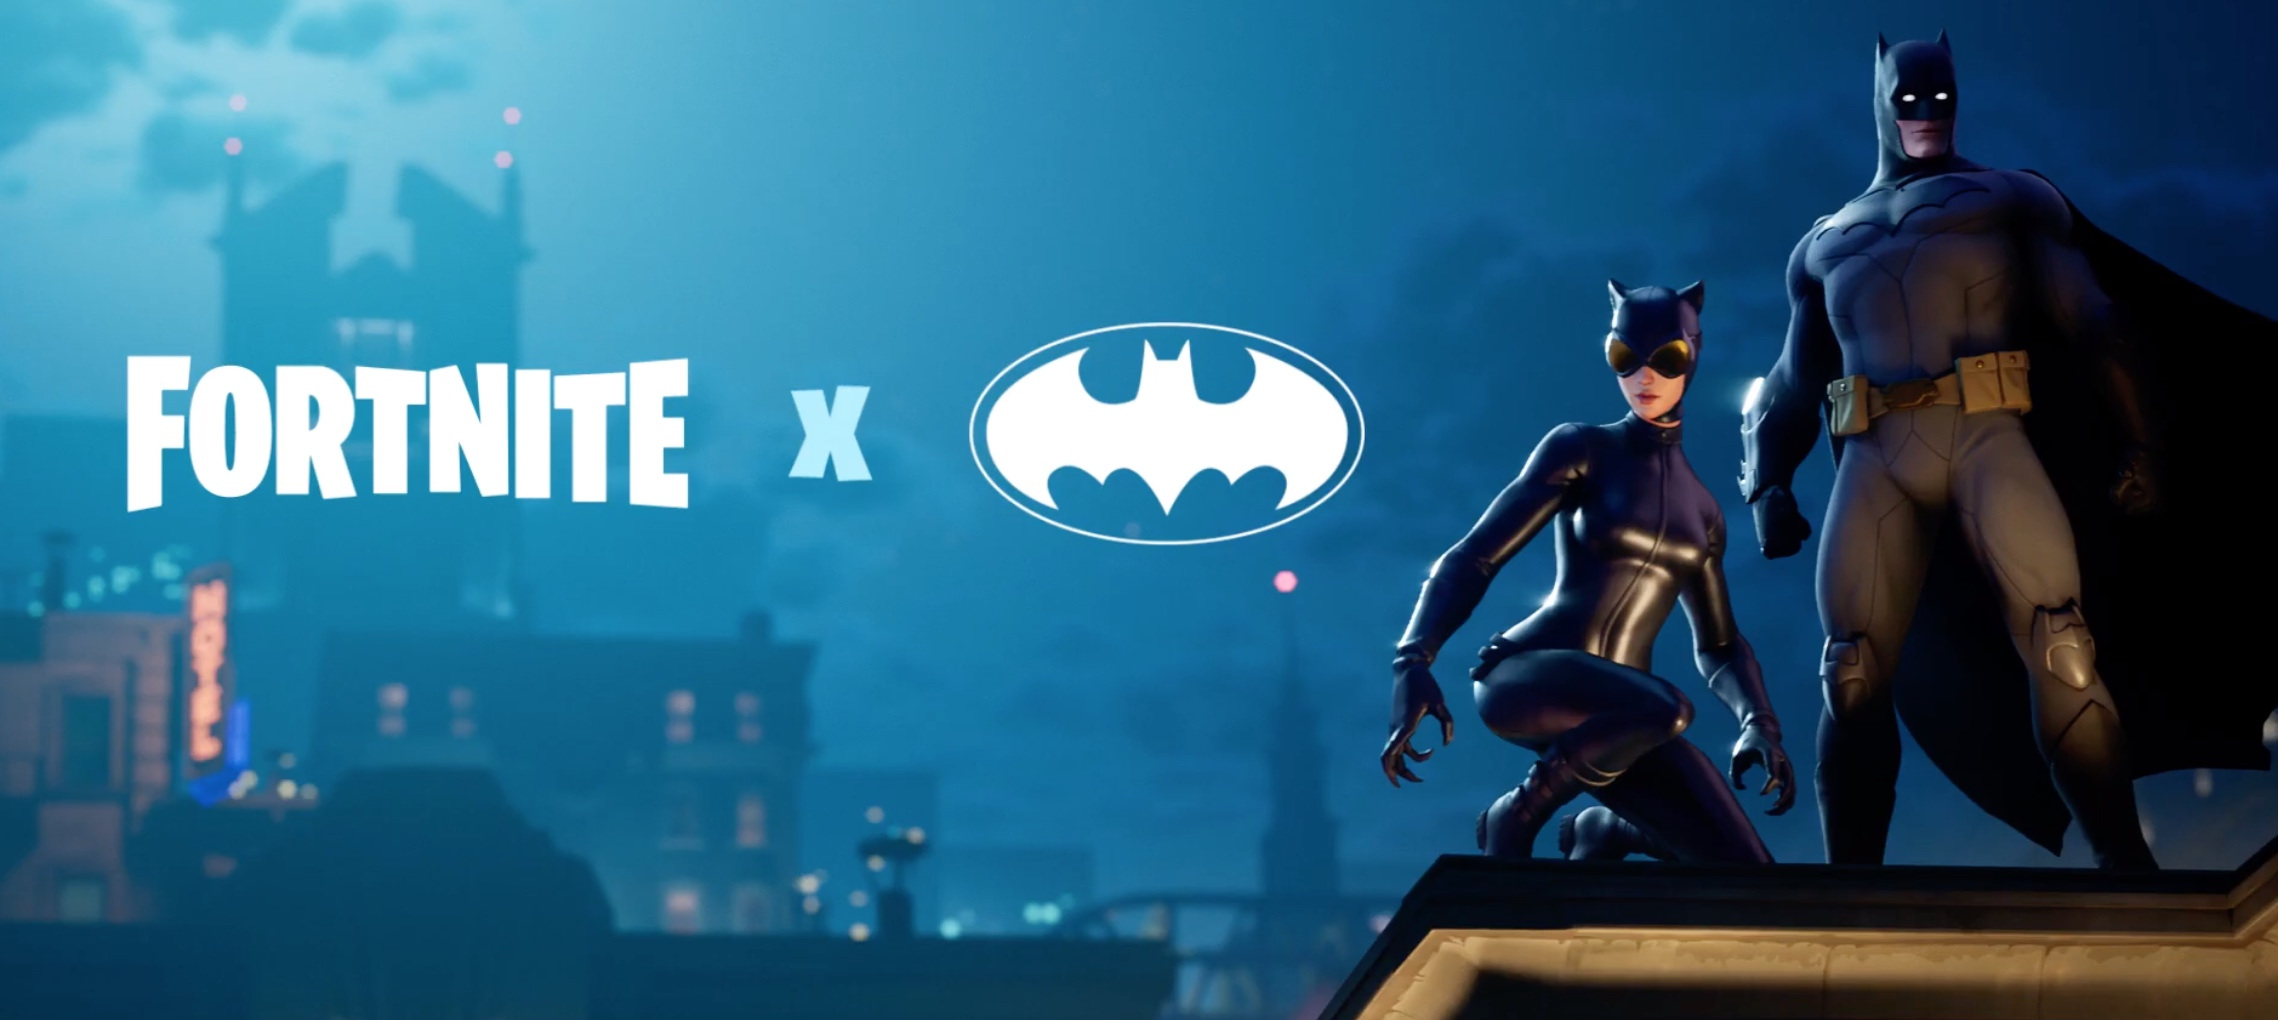 Fortnite Batman Catwoman collab